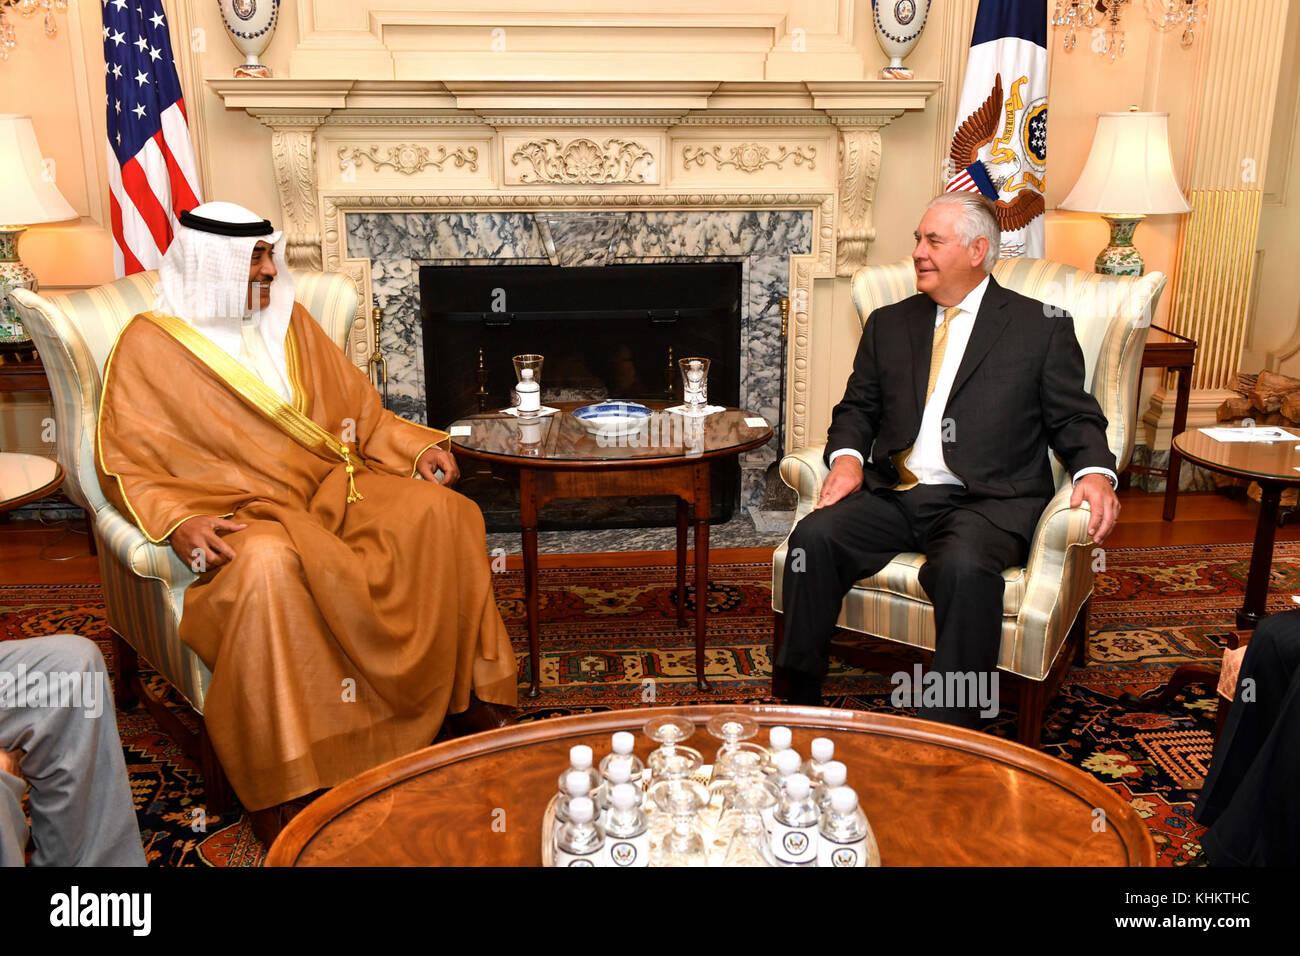 U.S. Secretary of State Rex Tillerson meets with Kuwaiti Foreign Minister Sheikh Sabah Al-Khaled Al-Hamad Al-Sabah - Stock Image